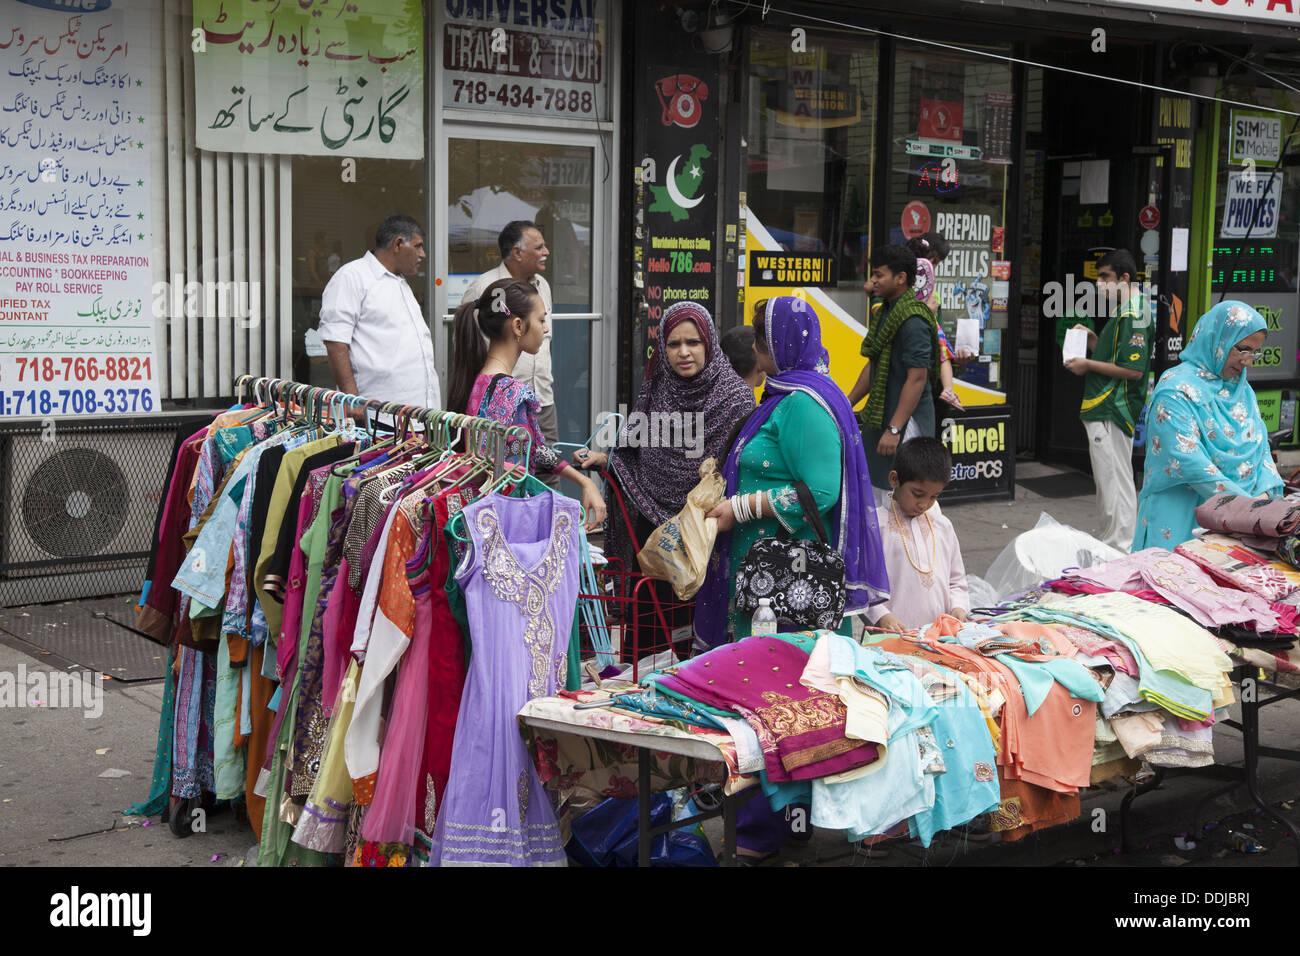 Pakistani immigrant neighborhood during Pakistan Independence celebrations in Brooklyn, NY. - Stock Image